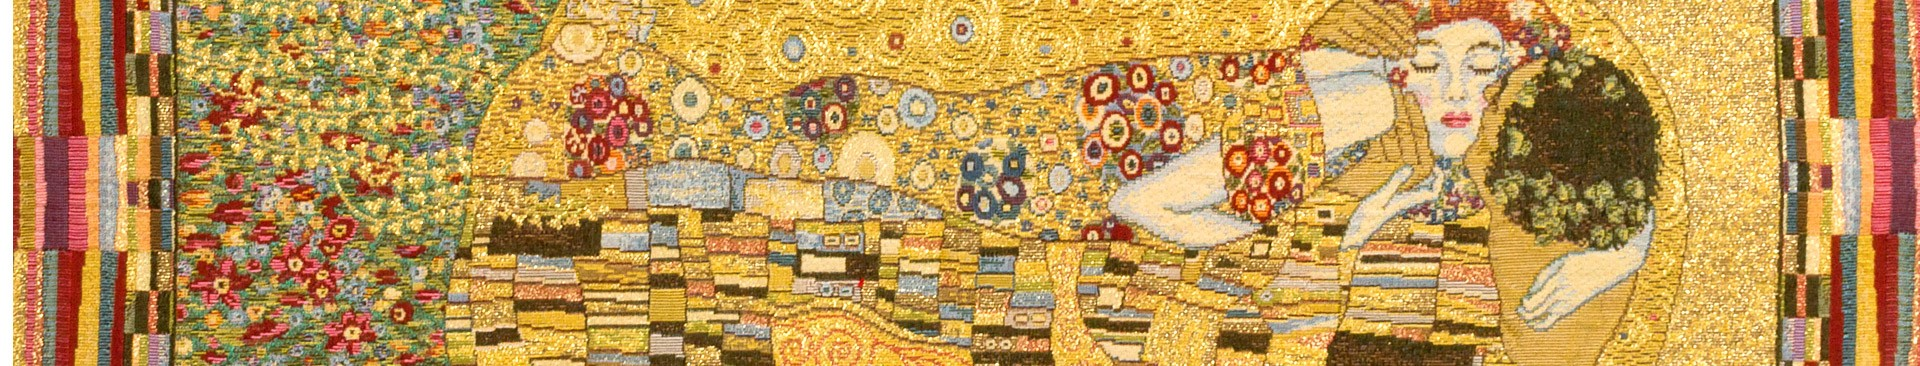 Tapisseries - Artistes et peintres - Klimt